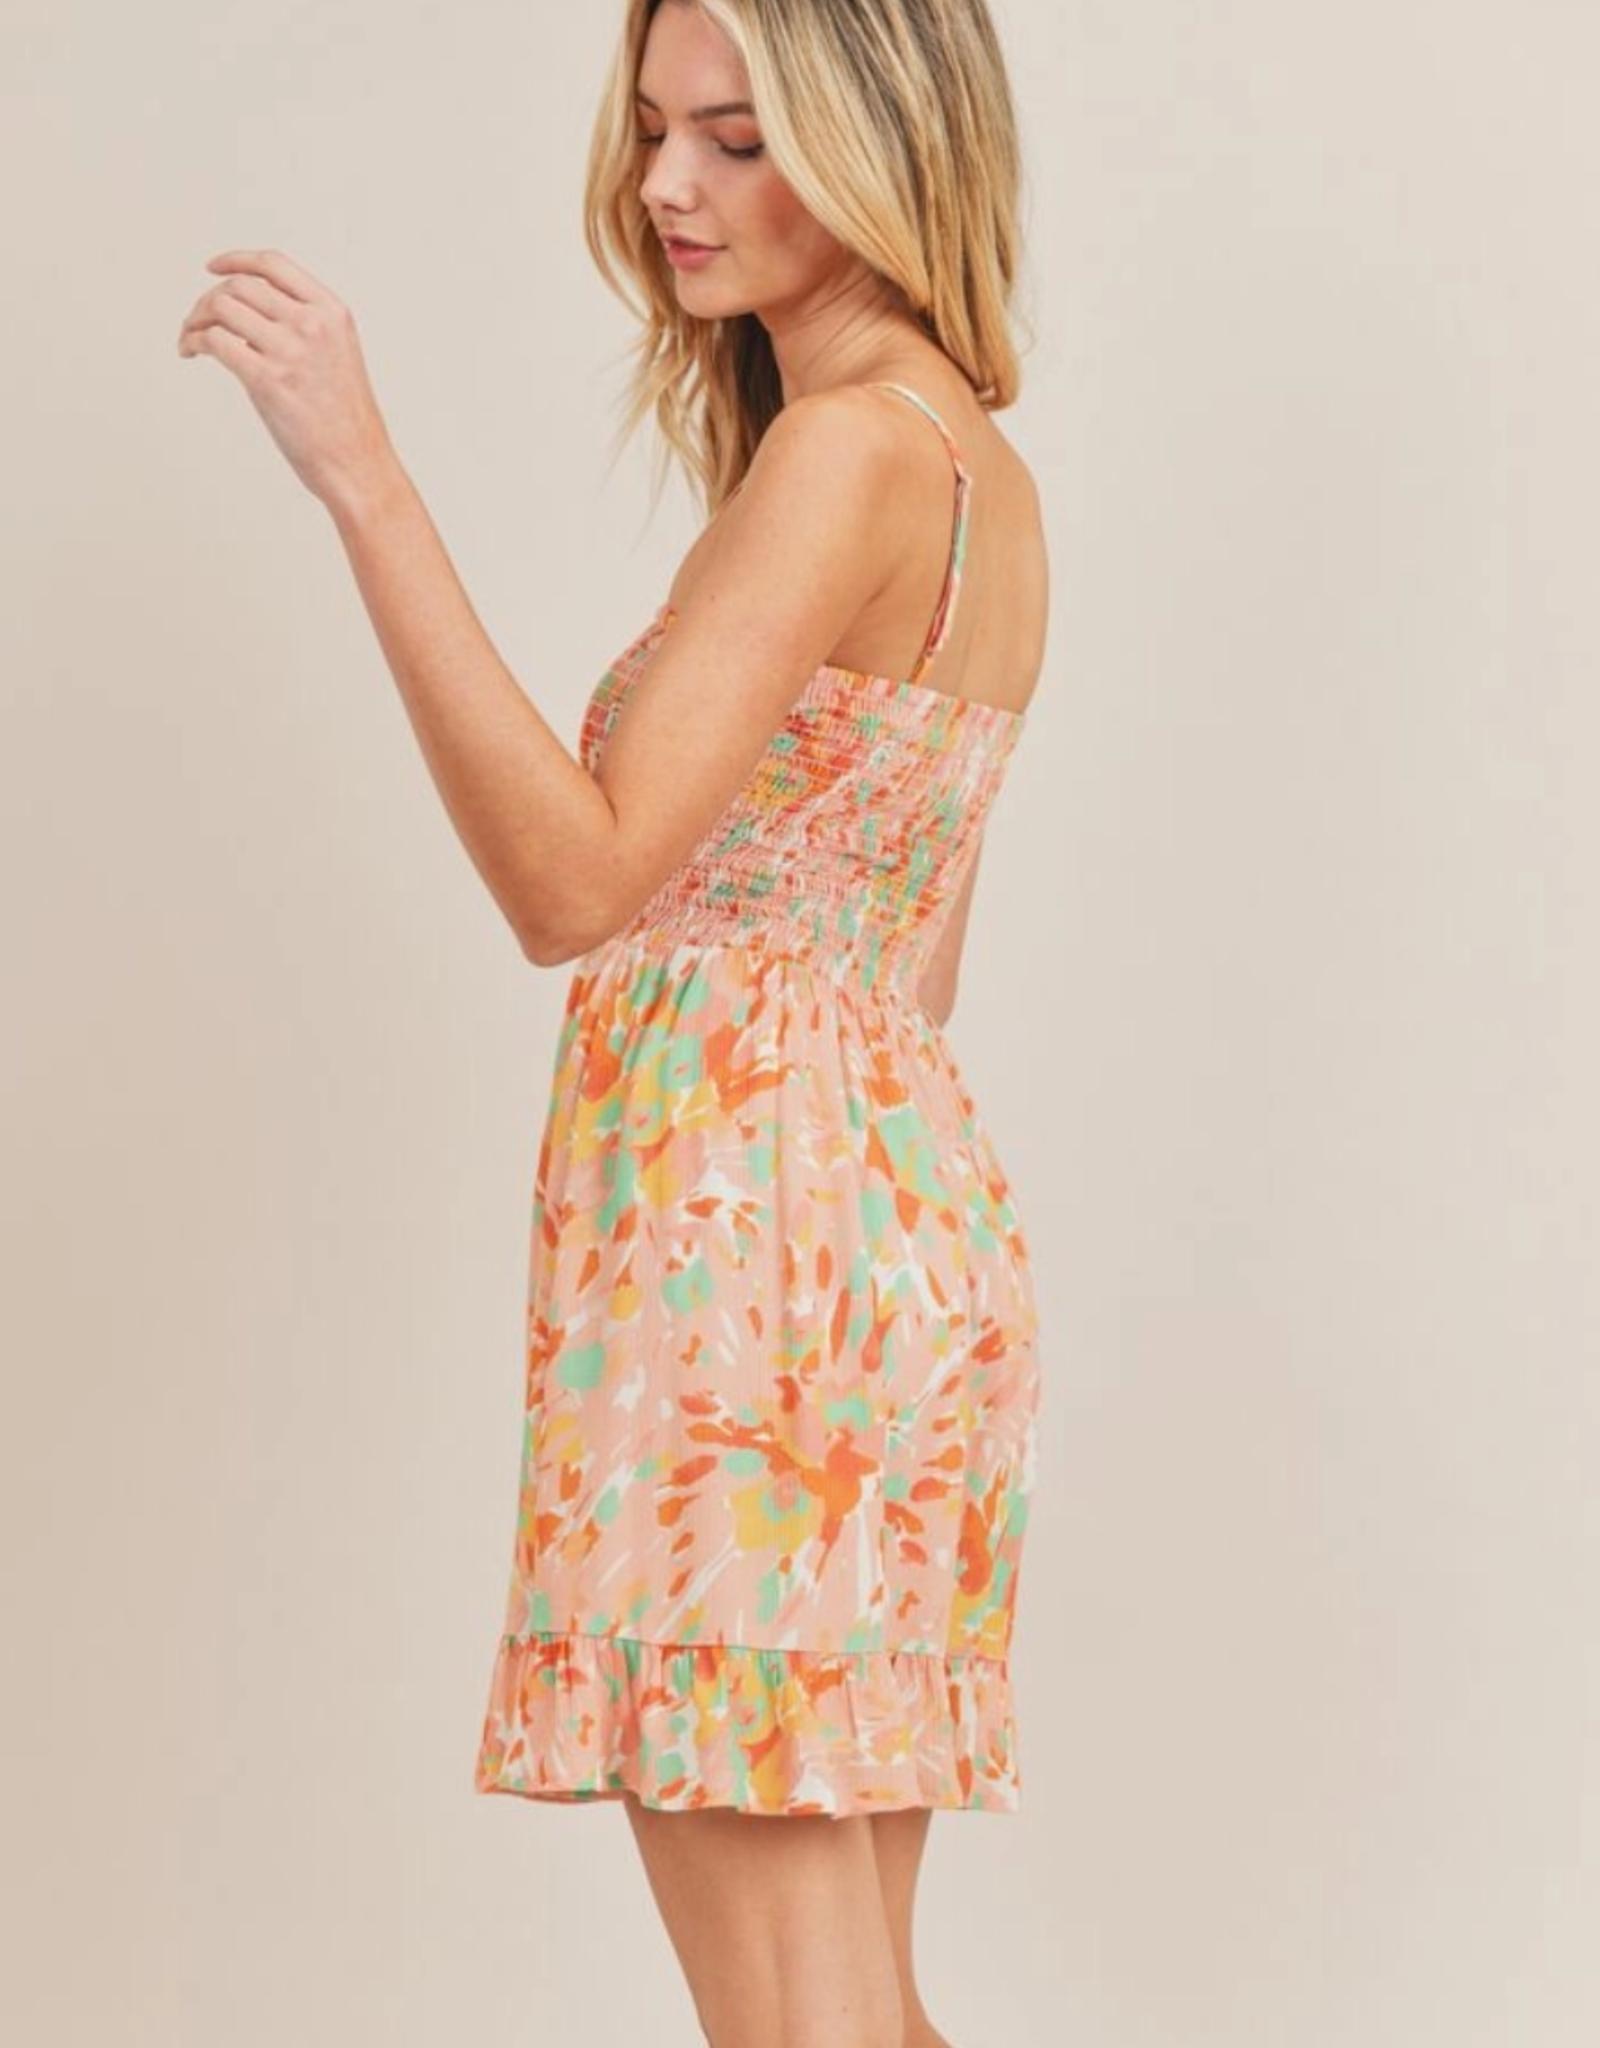 Spread Of Joy Smocked Mini Dress